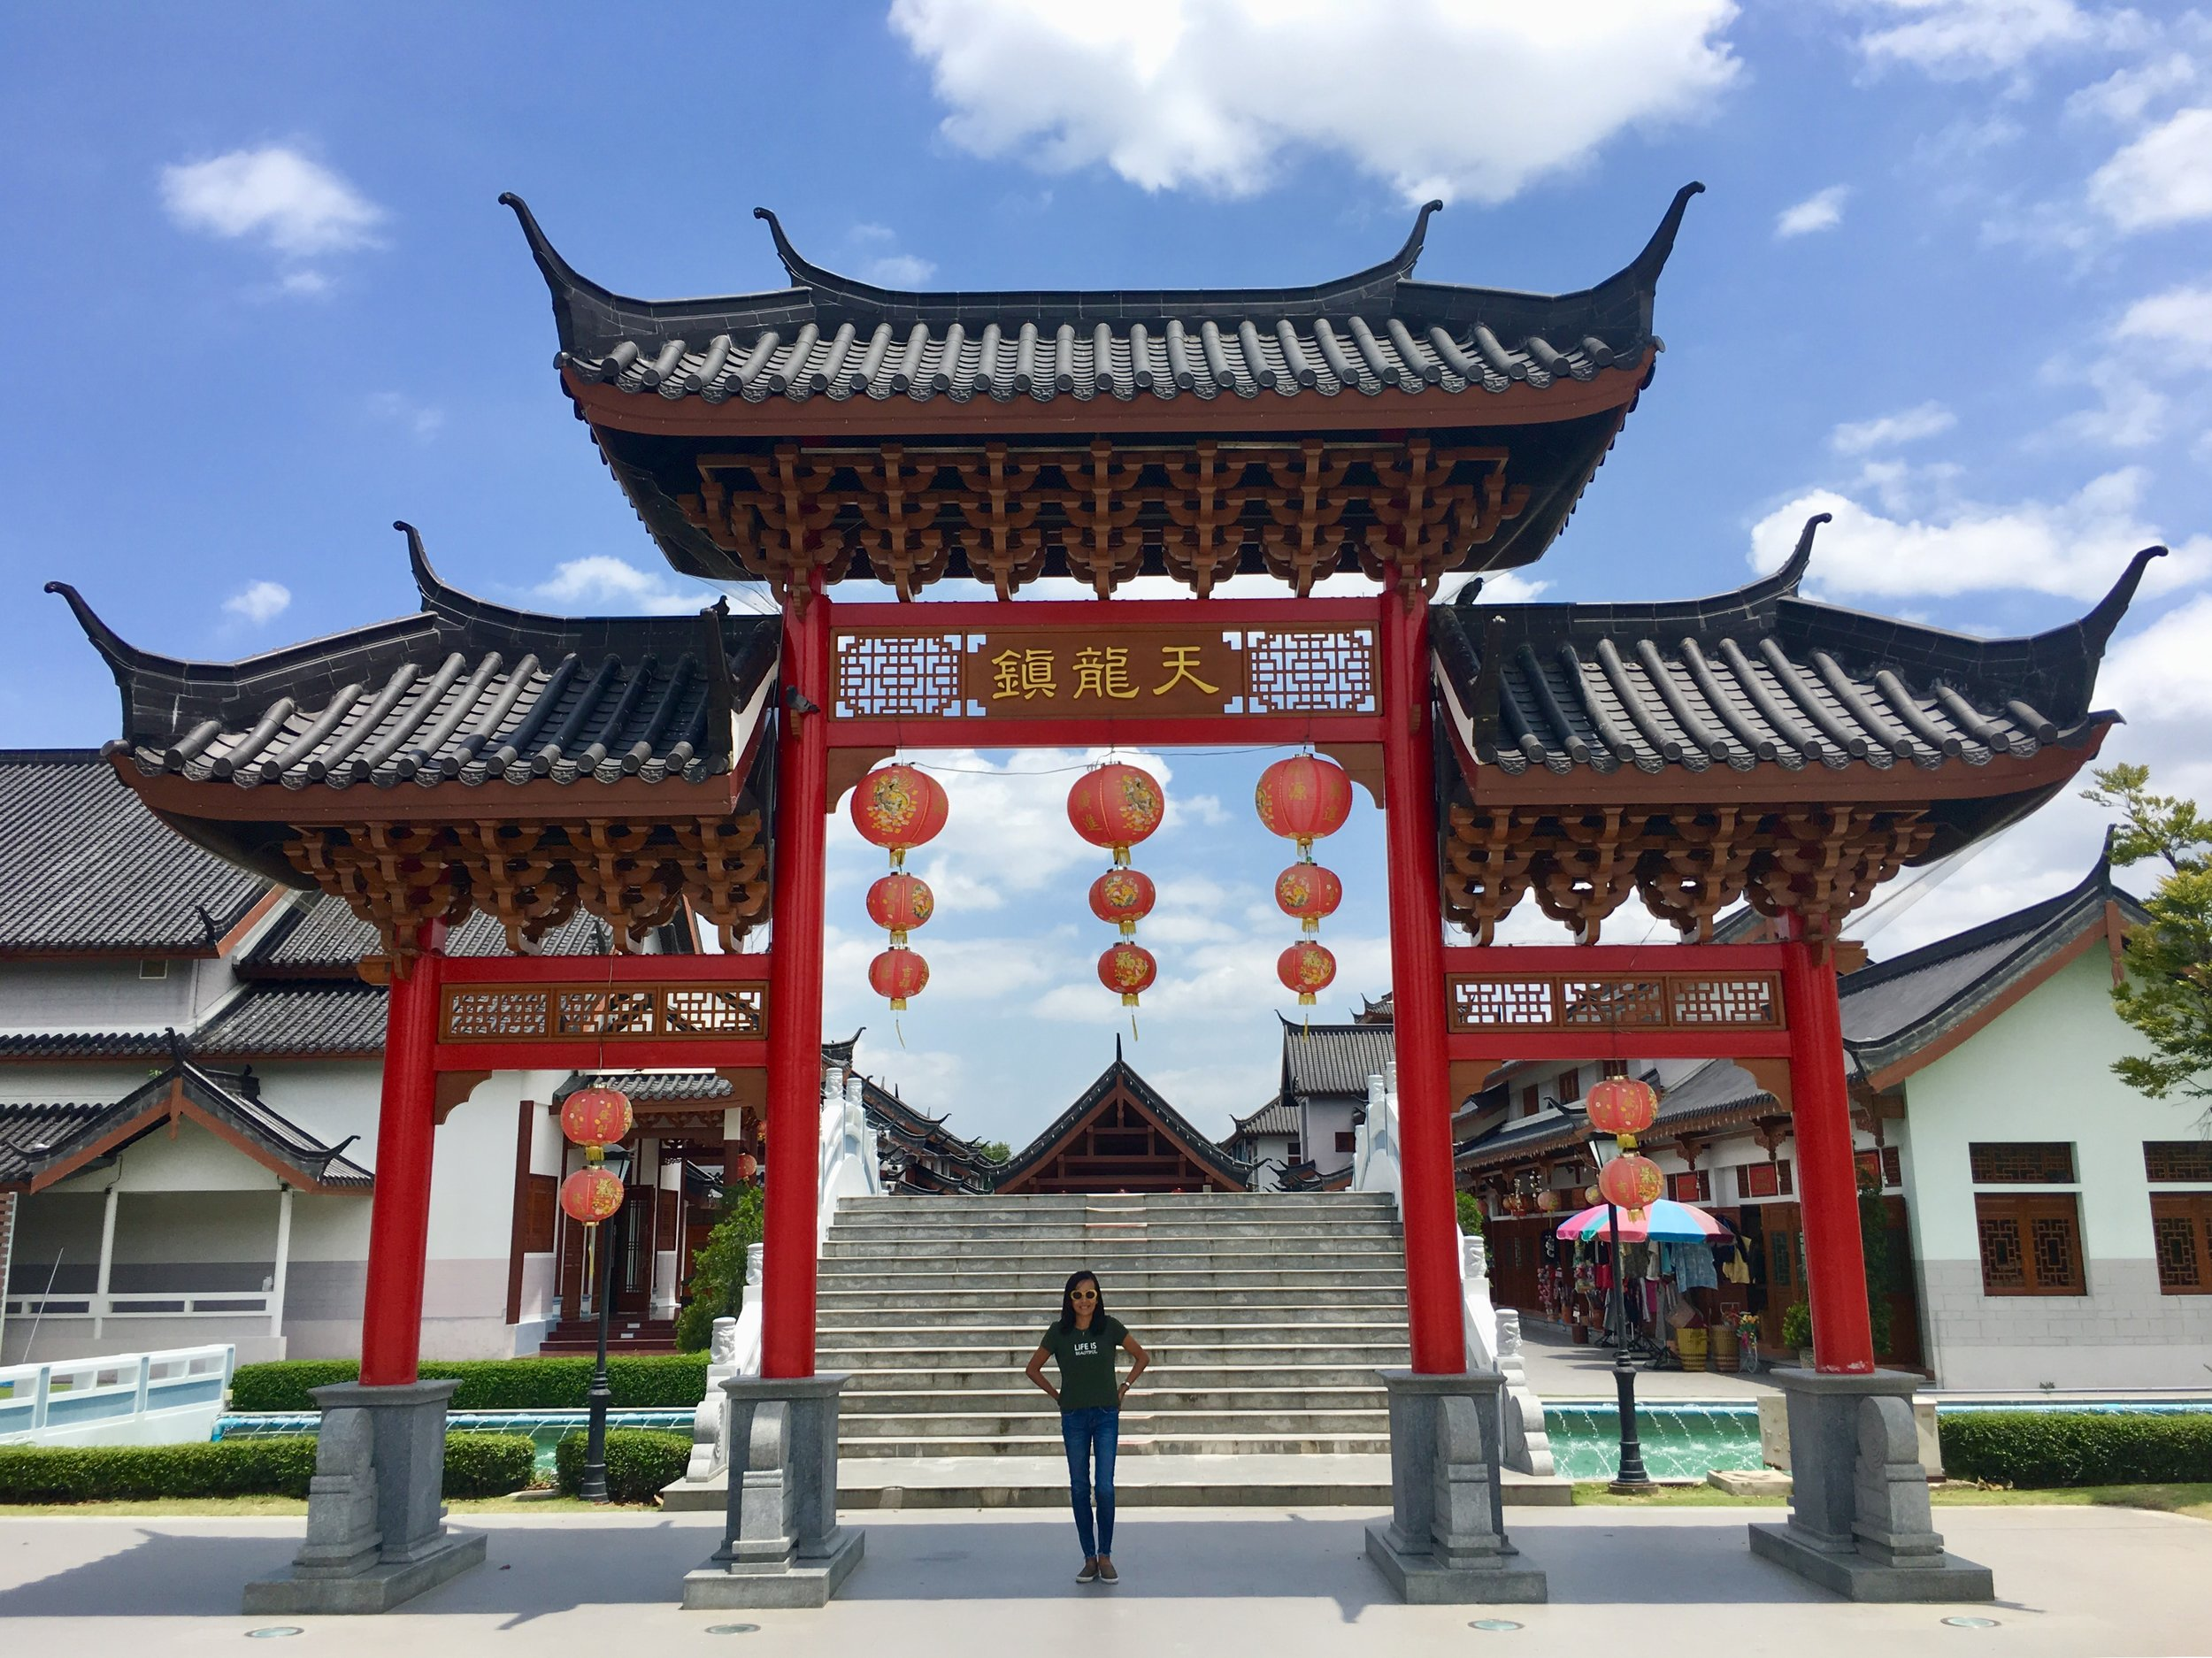 Replica city gate at City Pillar Shrine in Suphan Buri